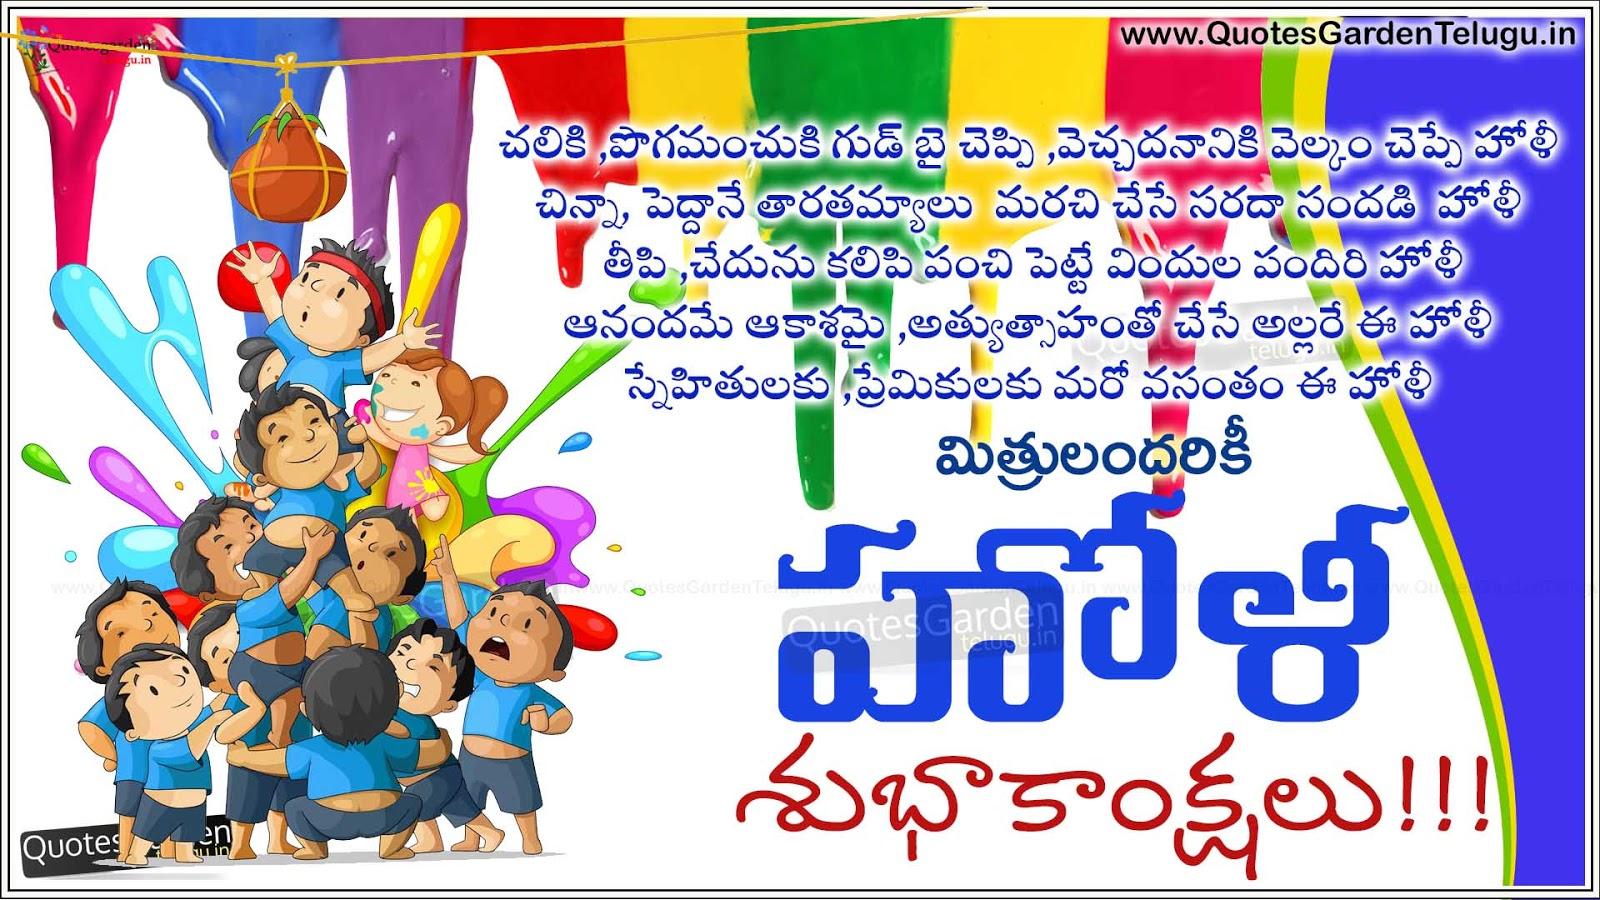 022 New2blatest2btelugu2bholi2bgreetings2bwallpapers Holi Festival Essay Top Of Colours In Hindi Punjabi Language For Class 2 Full